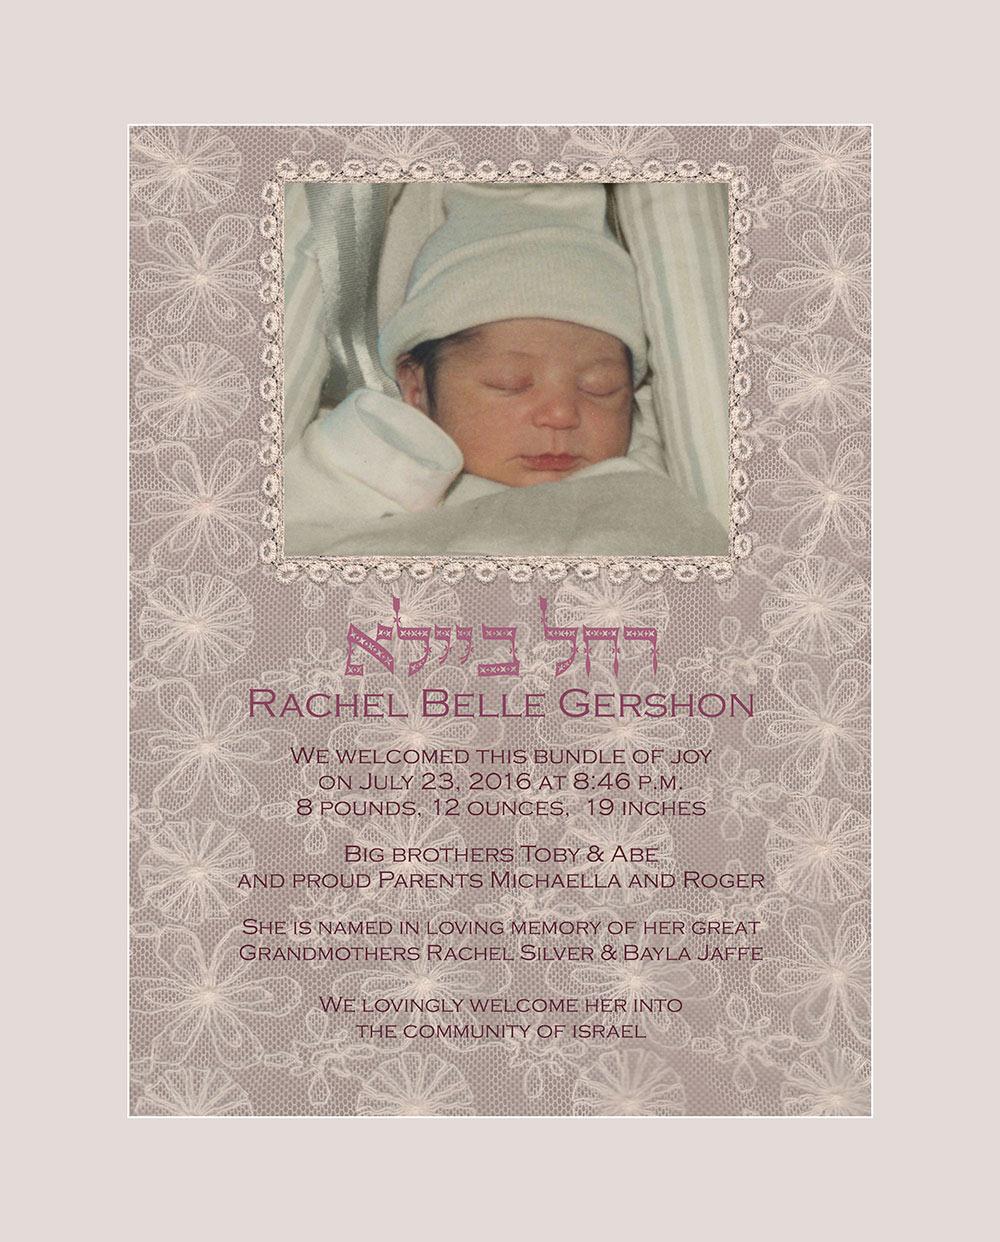 Baby Girl Lace Diamond Baby Wall Art G-BG-9c by Mickie Caspi